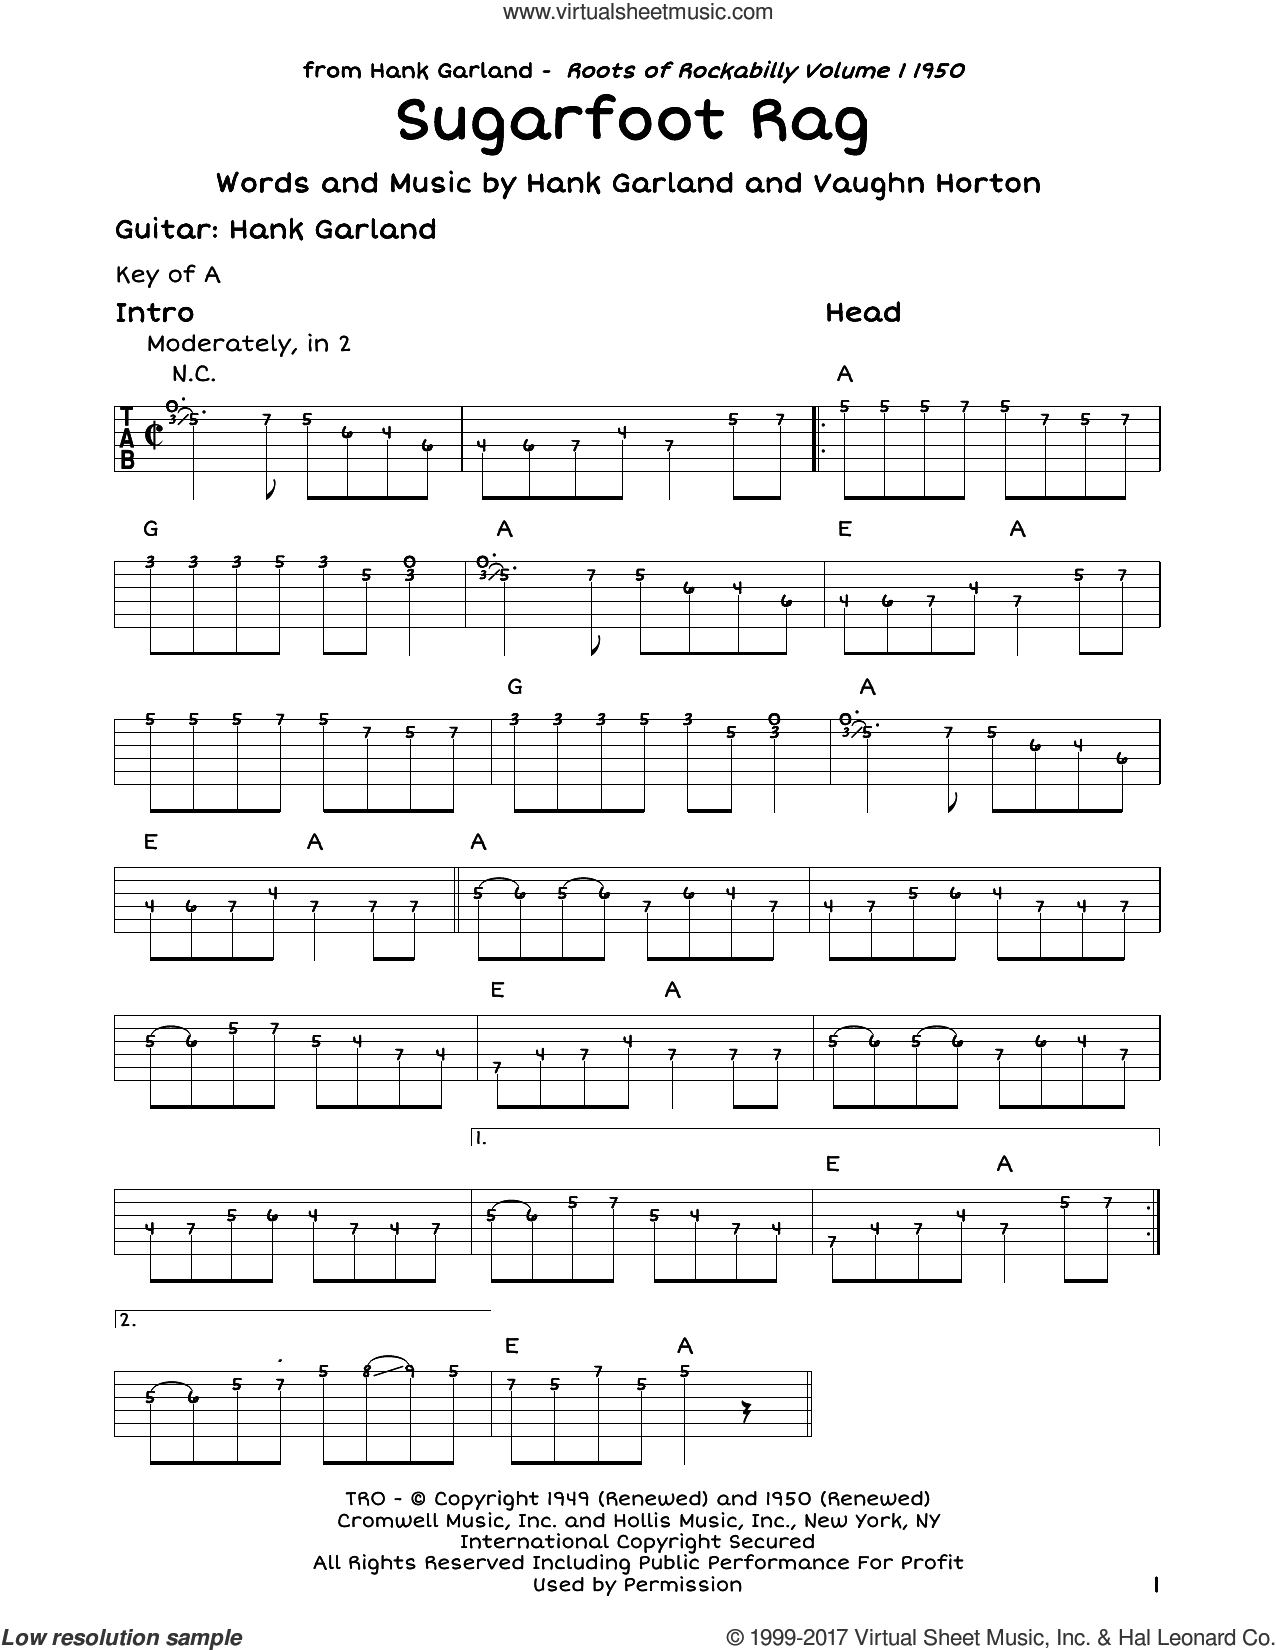 Sugarfoot Rag sheet music for guitar solo (lead sheet) by Red Foley, Hank Garland and Vaughn Horton, intermediate guitar (lead sheet)